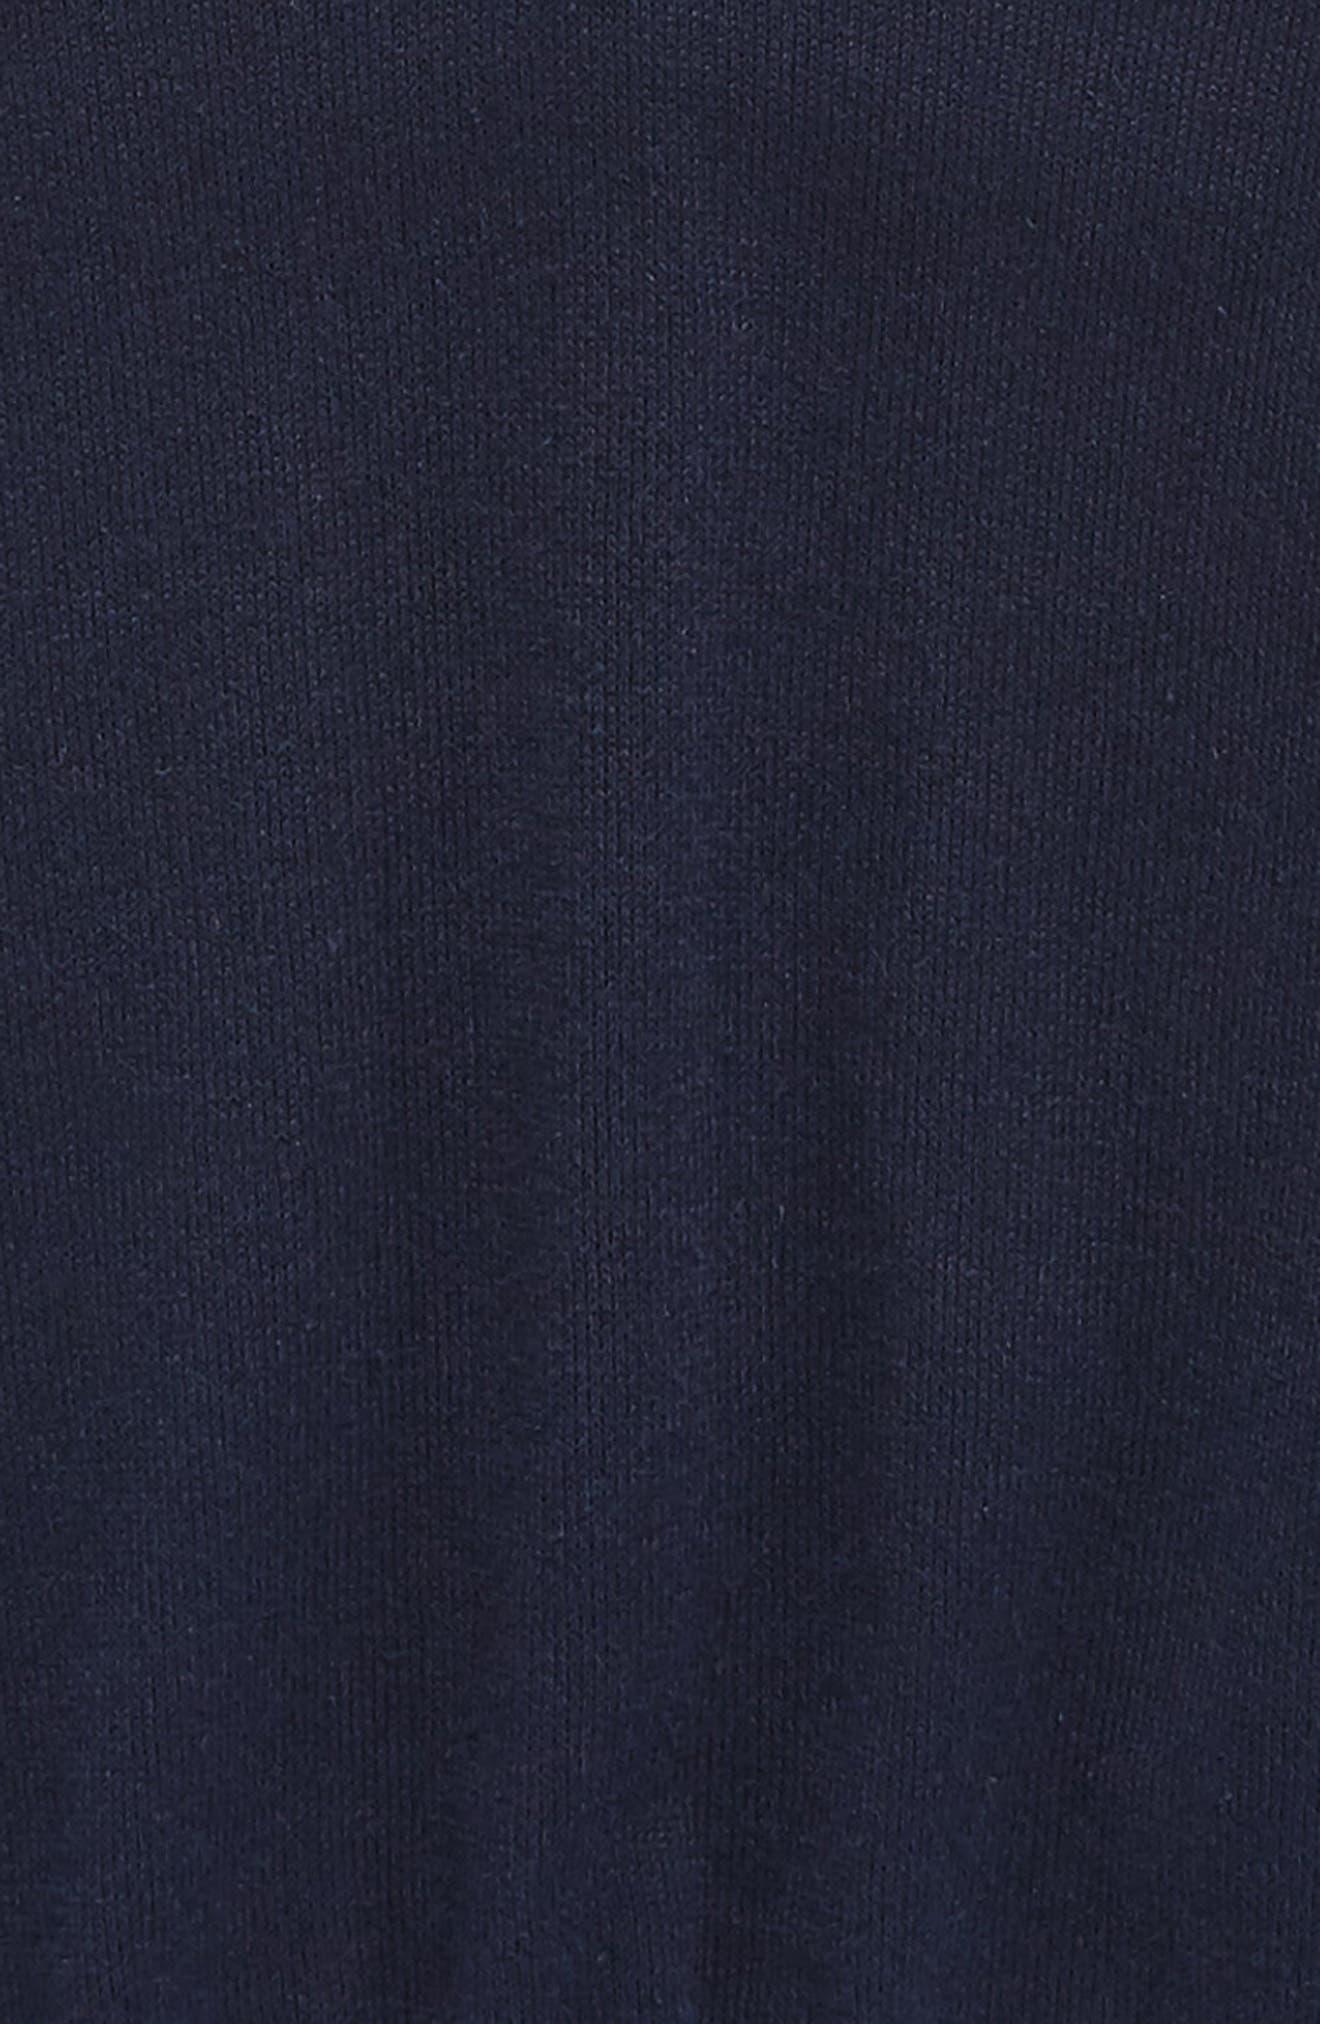 V-Neck Sweater,                             Alternate thumbnail 2, color,                             Solid Medium Blue